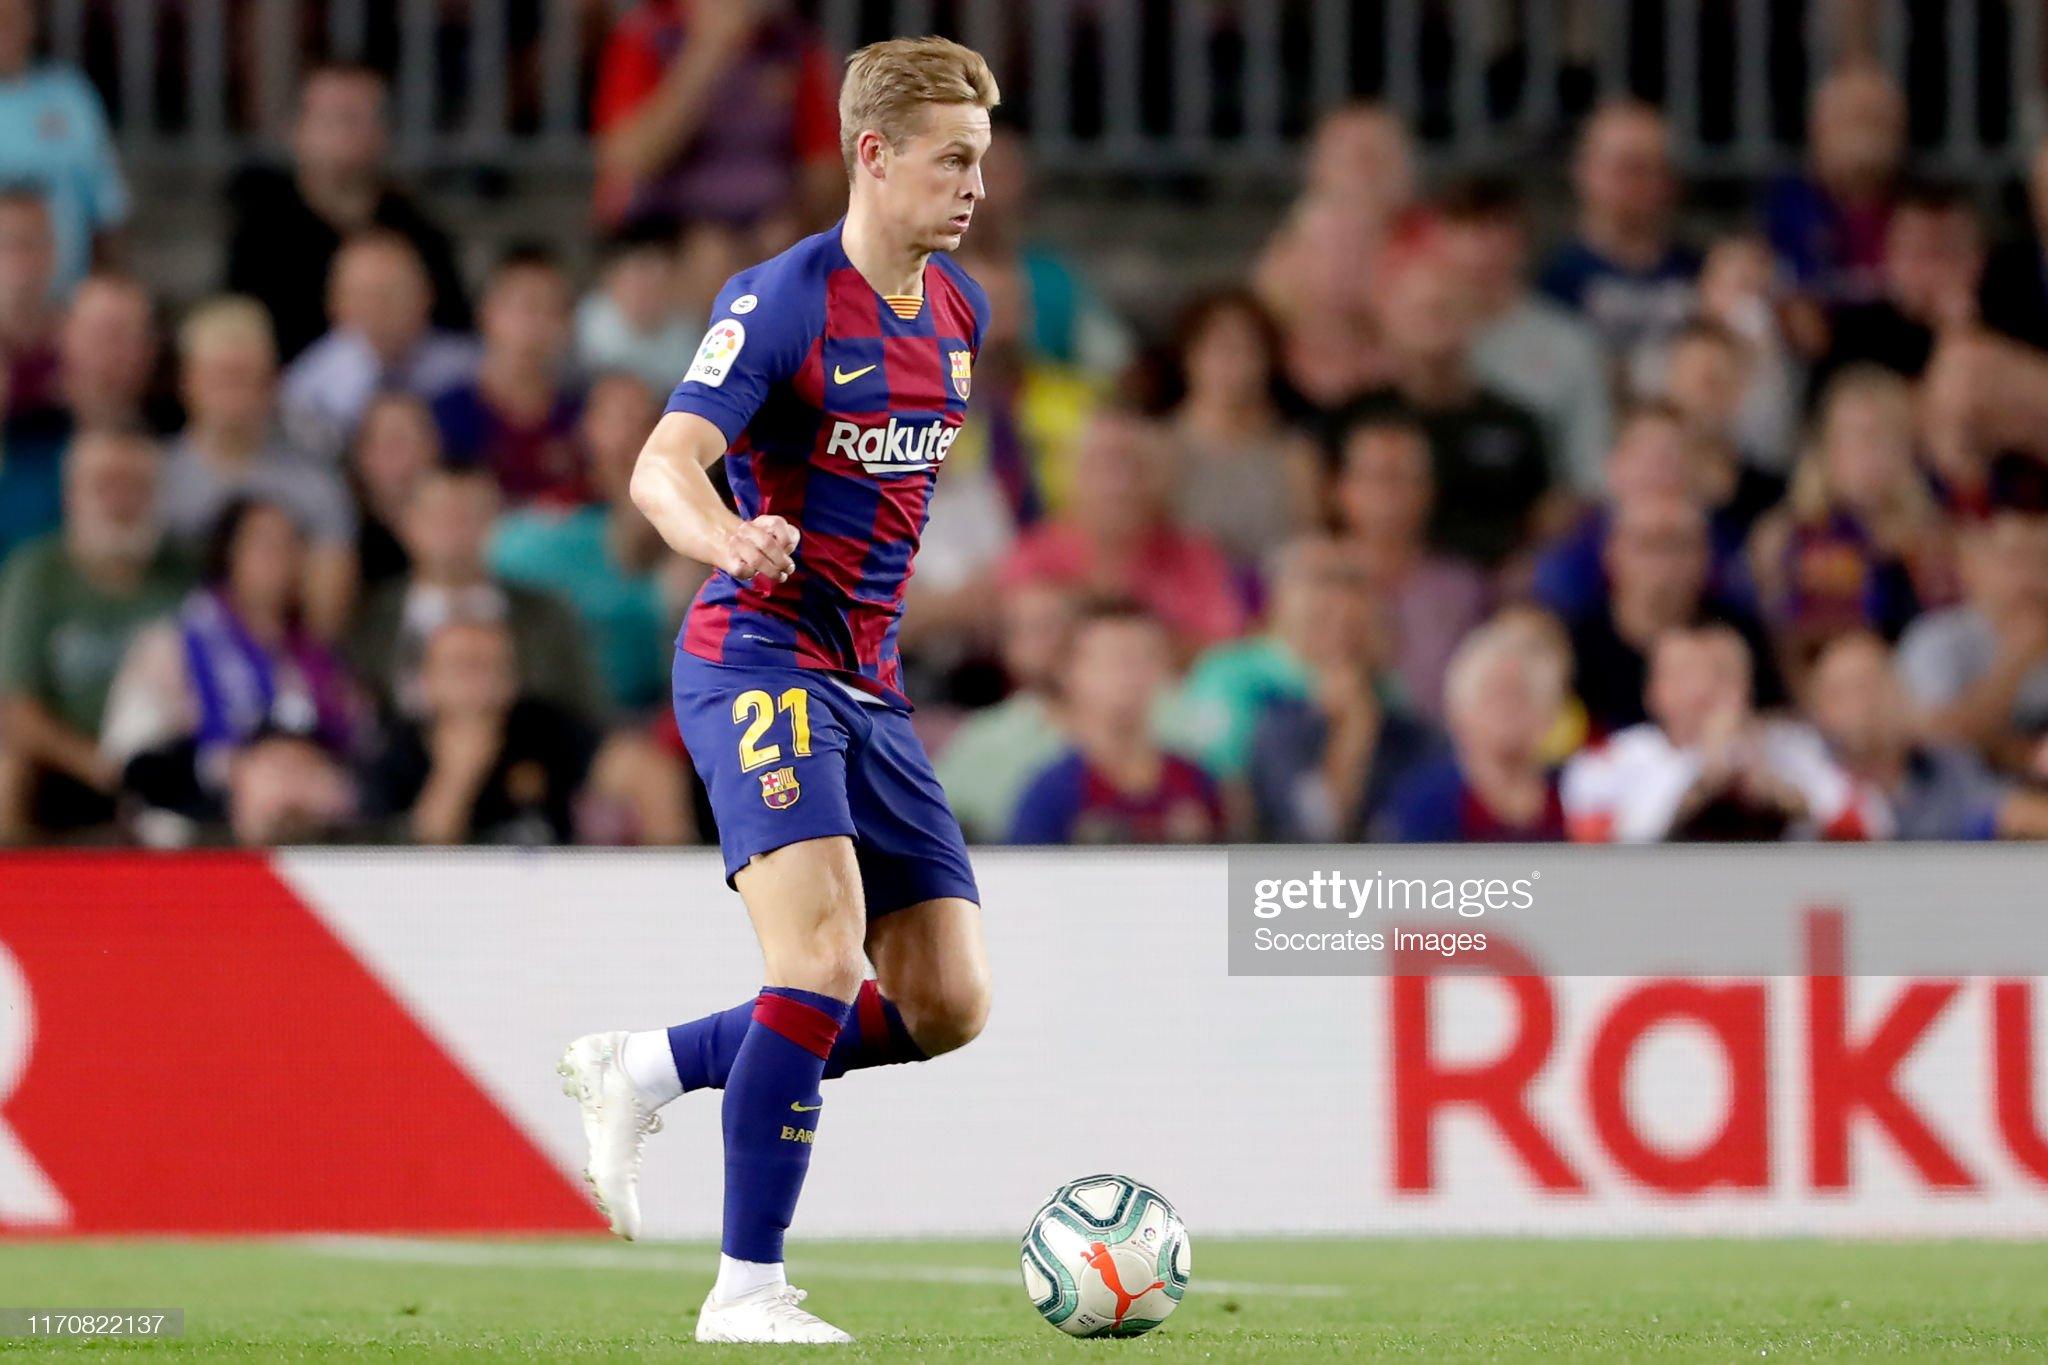 صور مباراة : برشلونة - فياريال 2-1 ( 24-09-2019 )  Frenkie-de-jong-of-fc-barcelona-during-the-la-liga-santander-match-picture-id1170822137?s=2048x2048